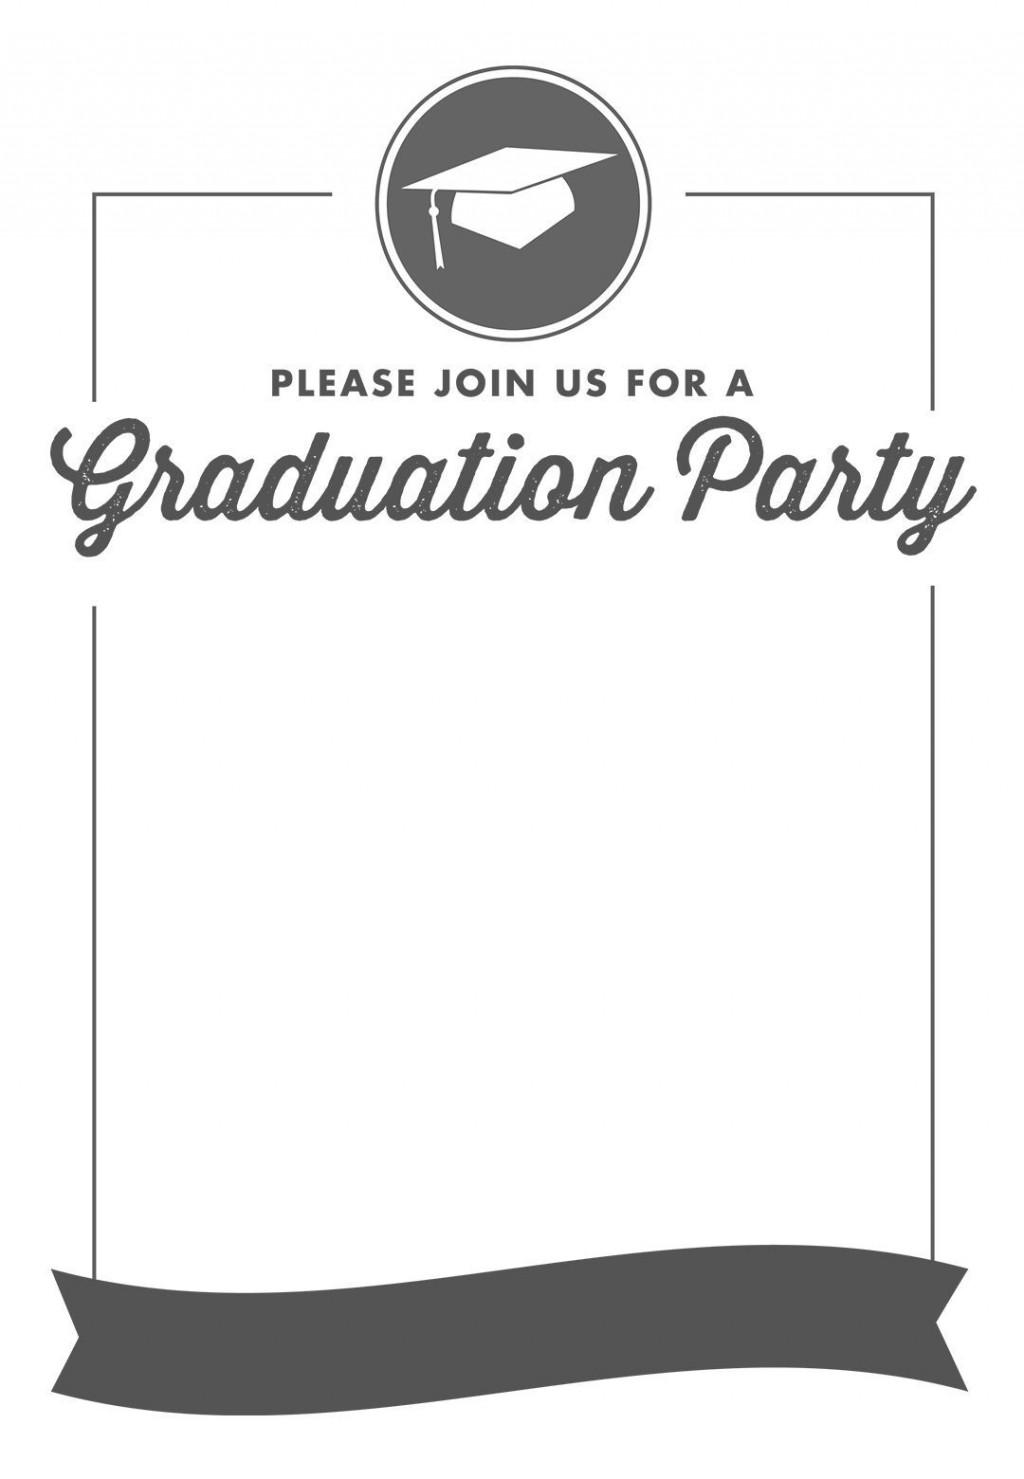 001 Unique Graduation Party Invitation Template Photo  Templates 4 Per Page Free ReceptionLarge